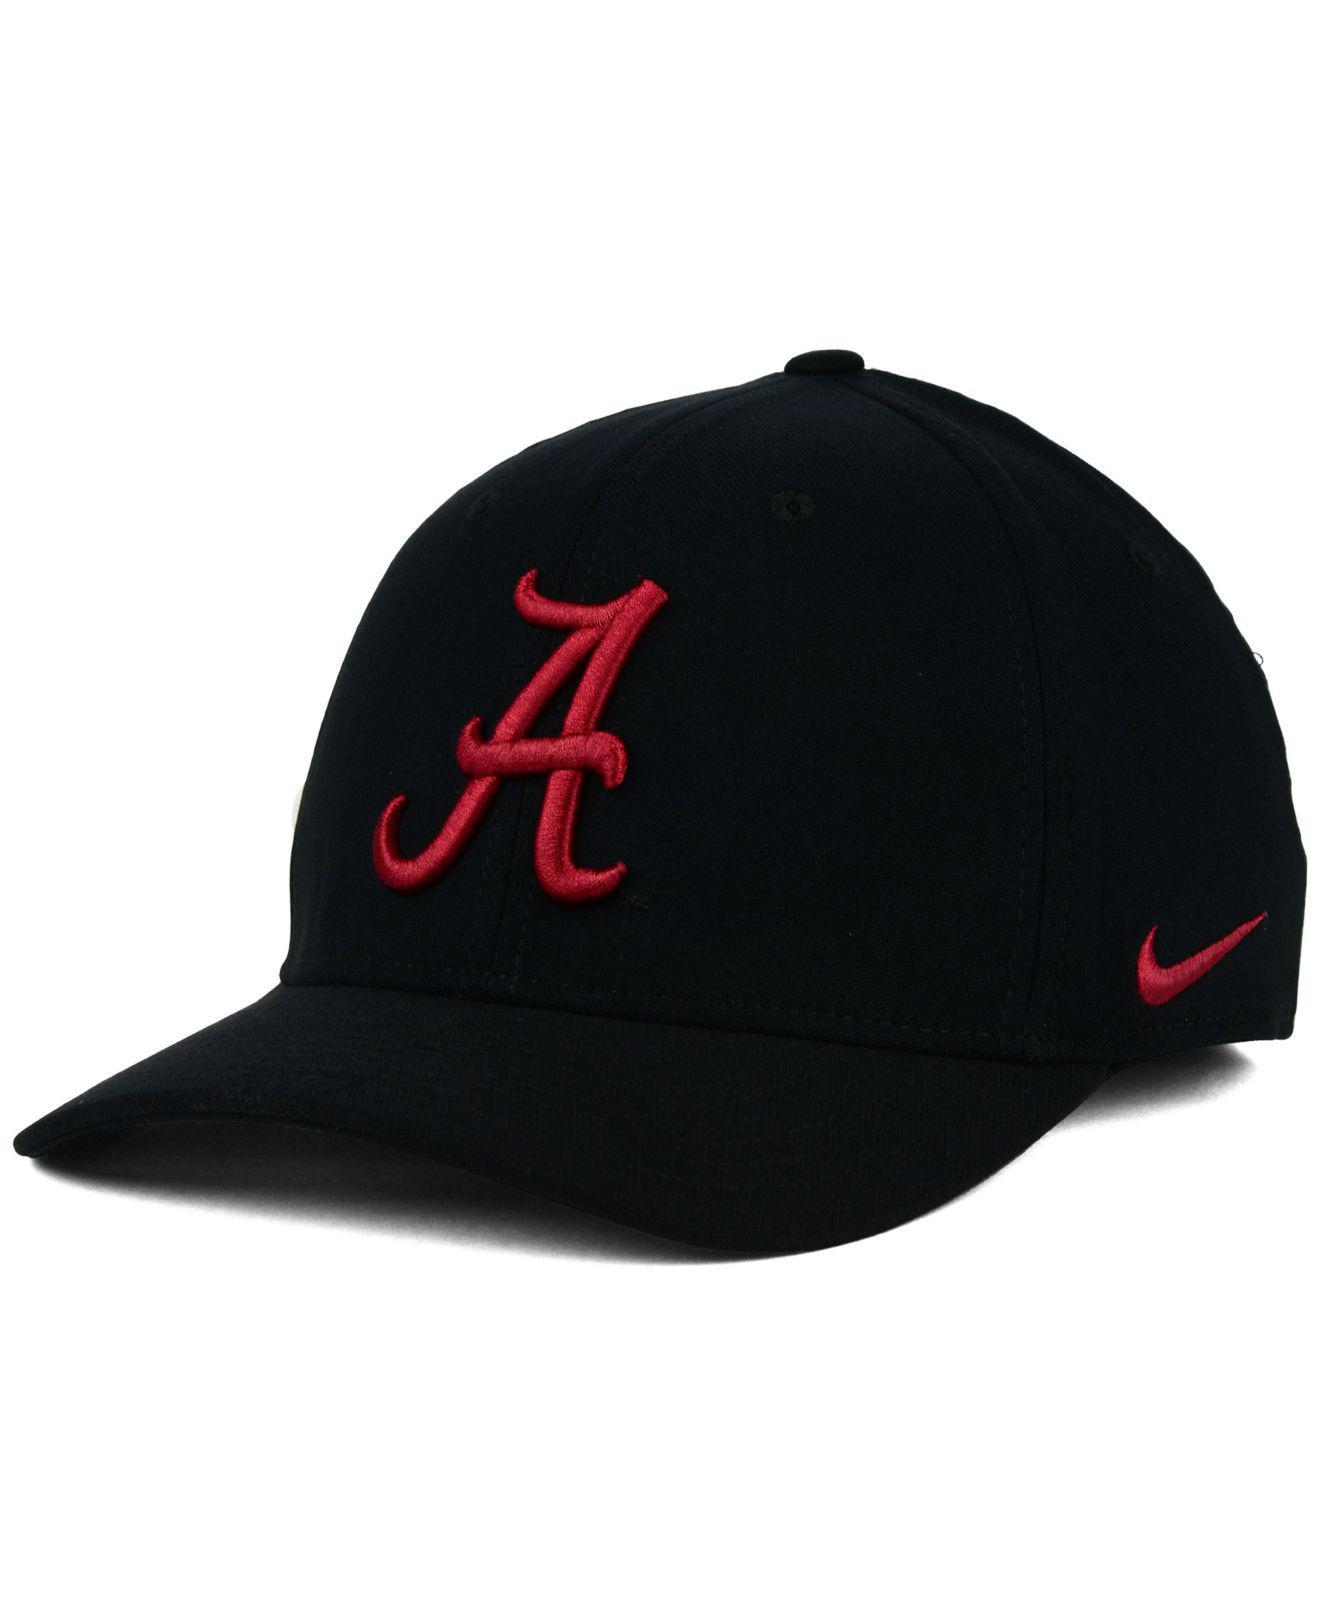 8f8e1d0aee3 Lyst - Nike Alabama Crimson Tide Classic Swoosh Cap in Black for Men